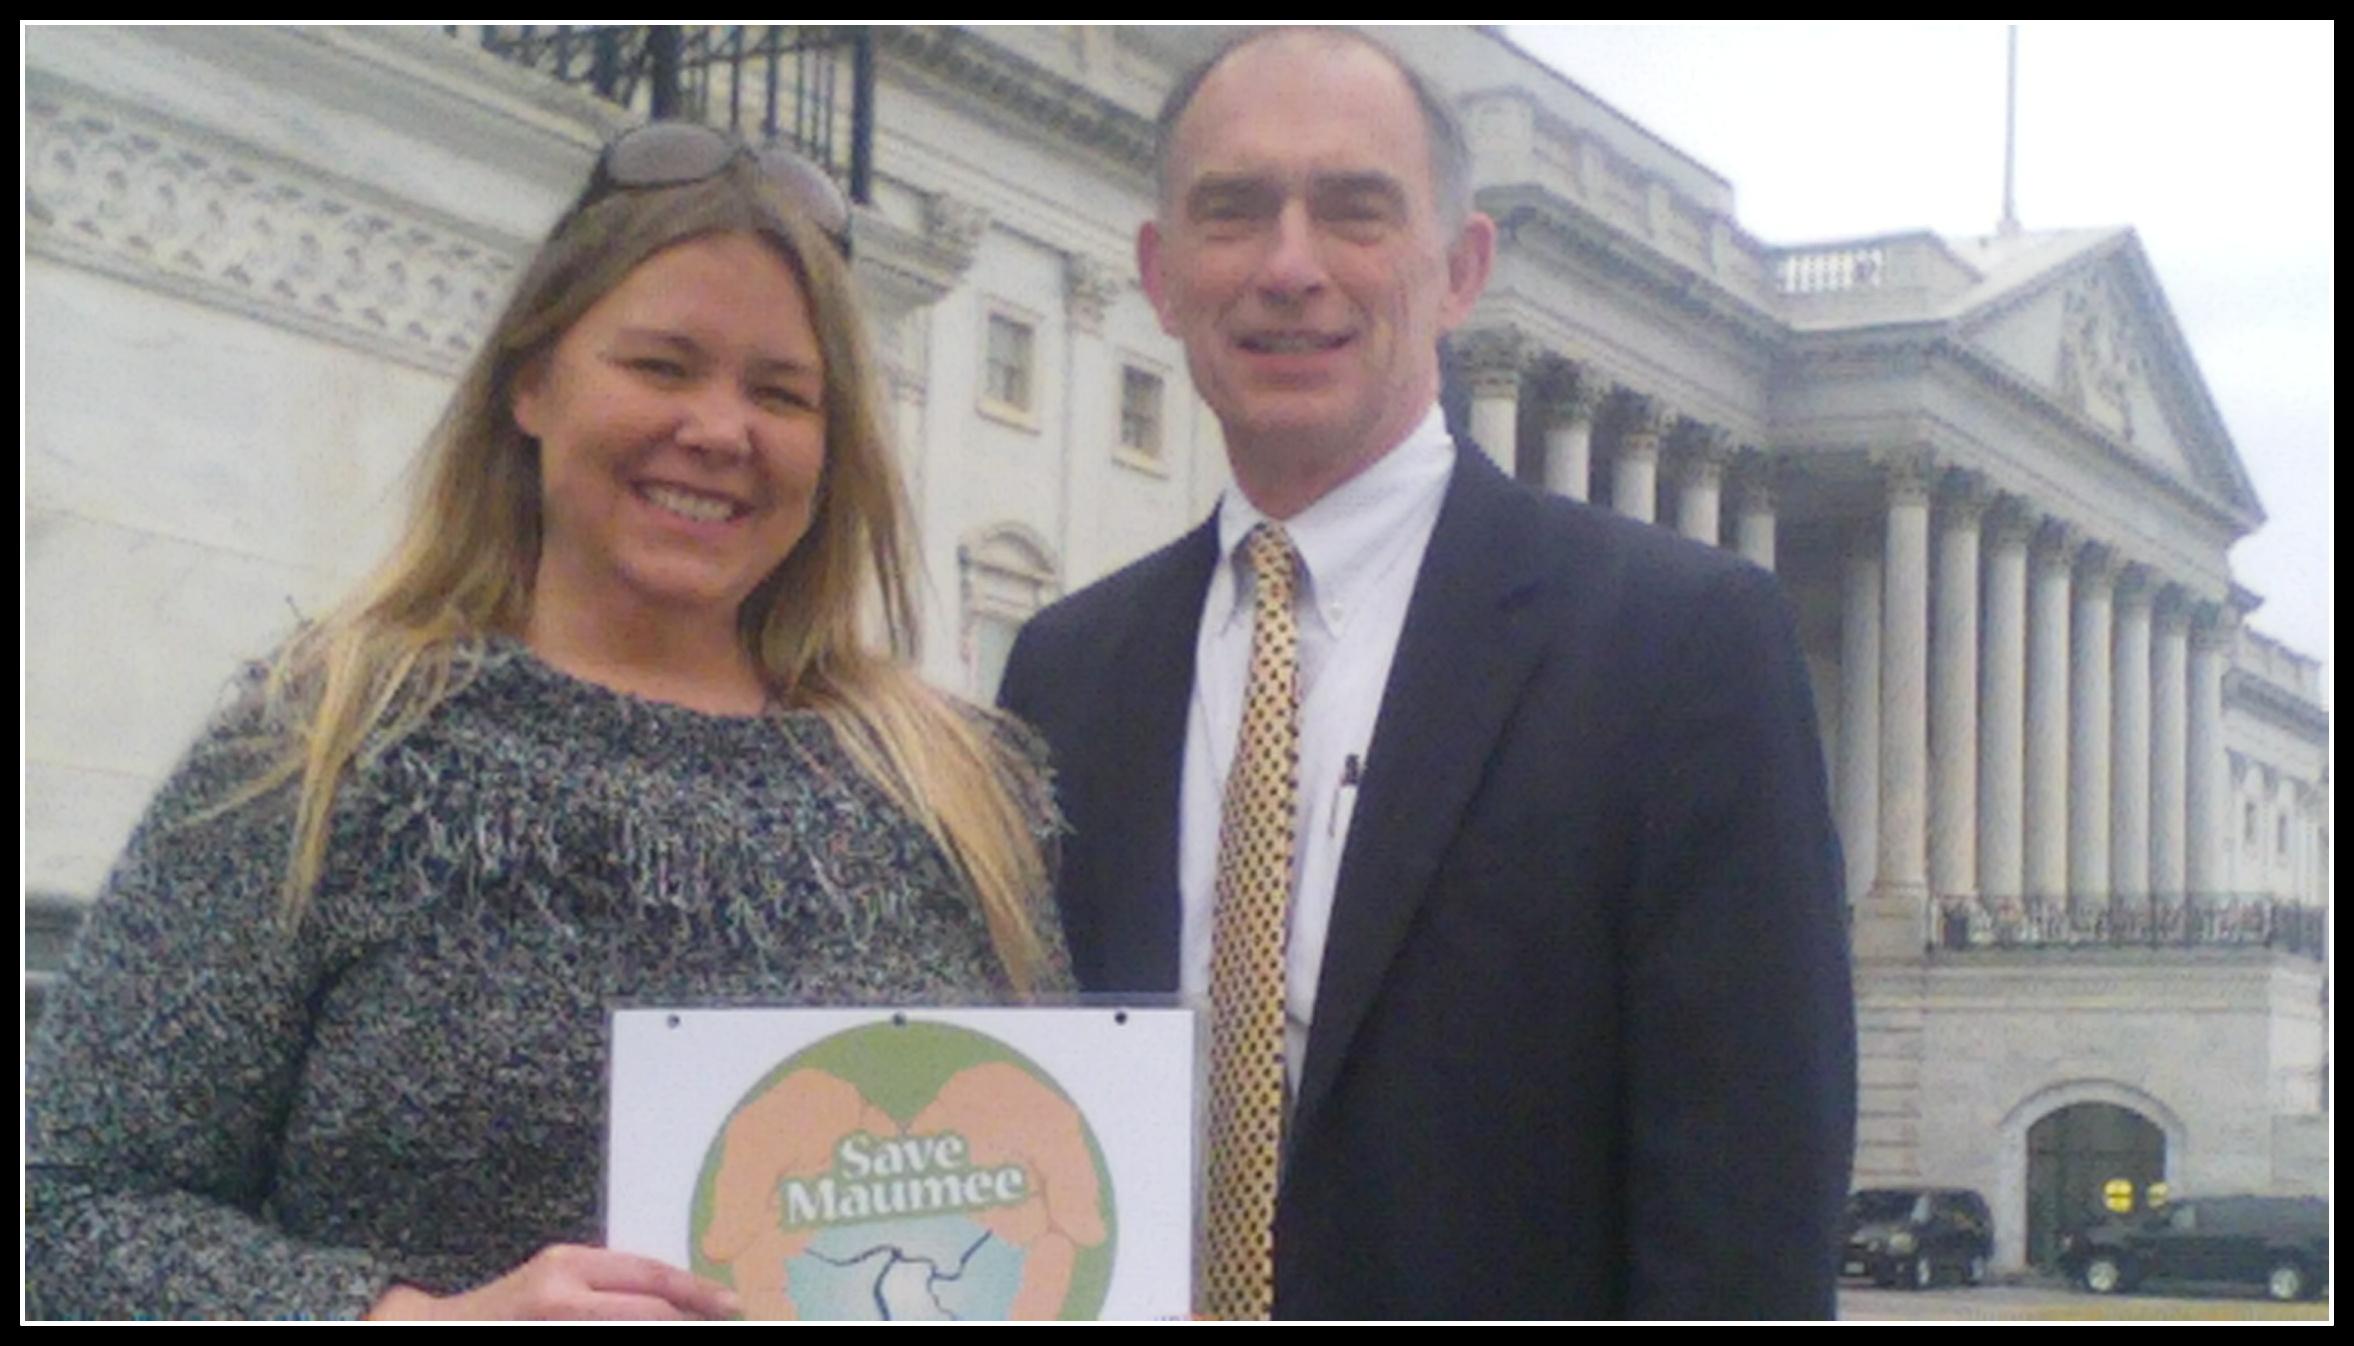 Abigail King & U.S. House of Representatives, Peter Viscloski